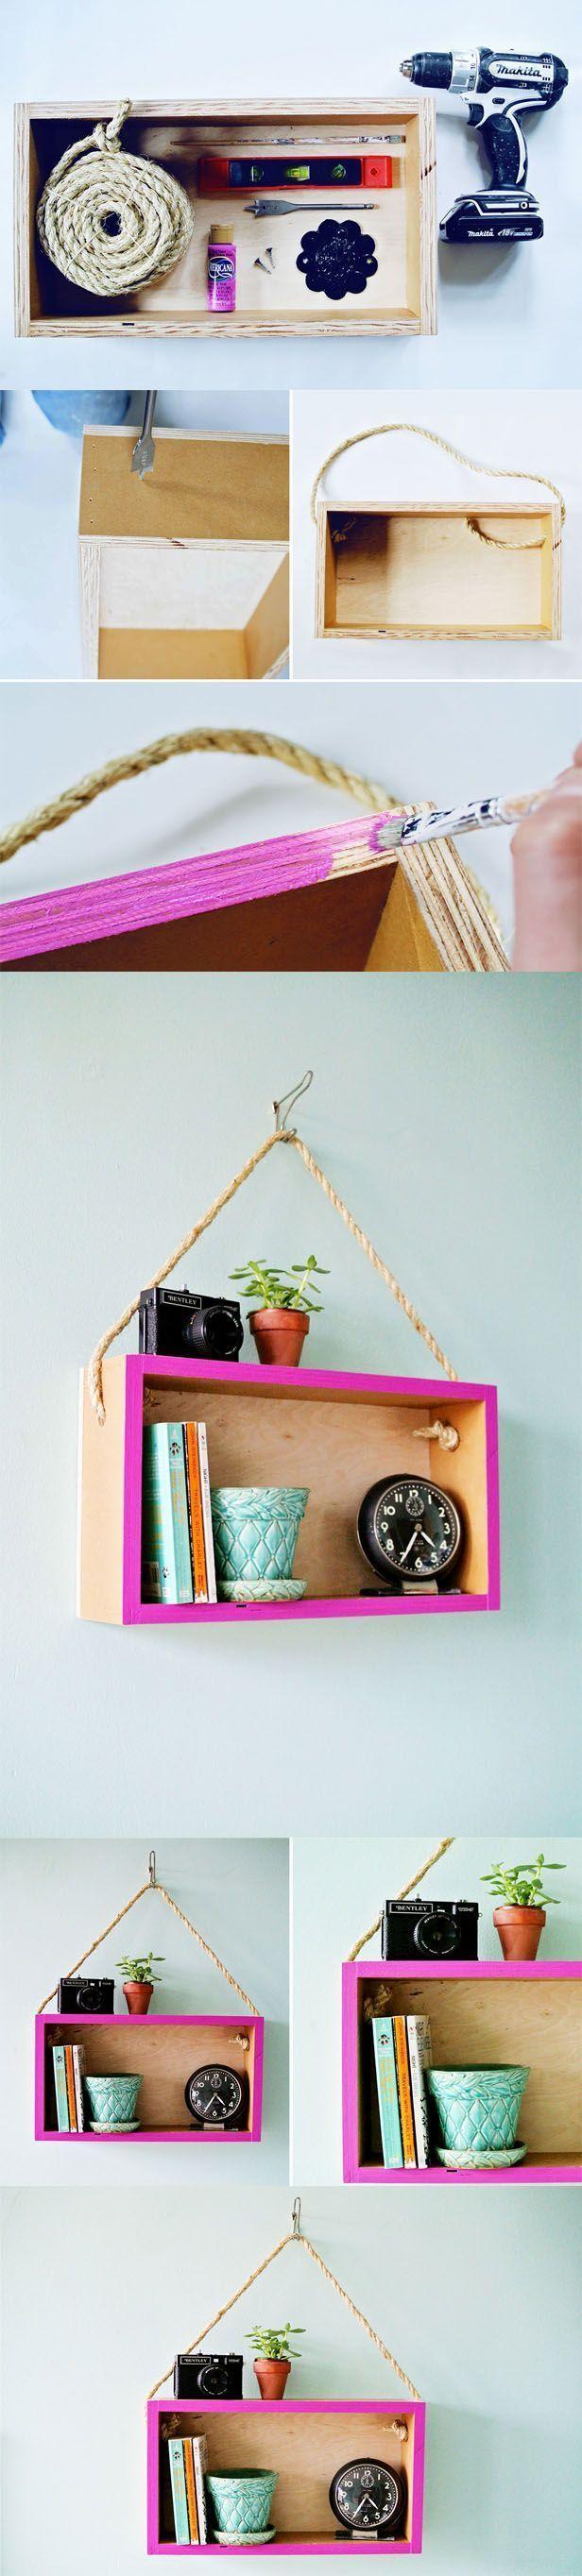 caja-colgante-estanteria-reciclaje-diy-muy-ingeniodo-1